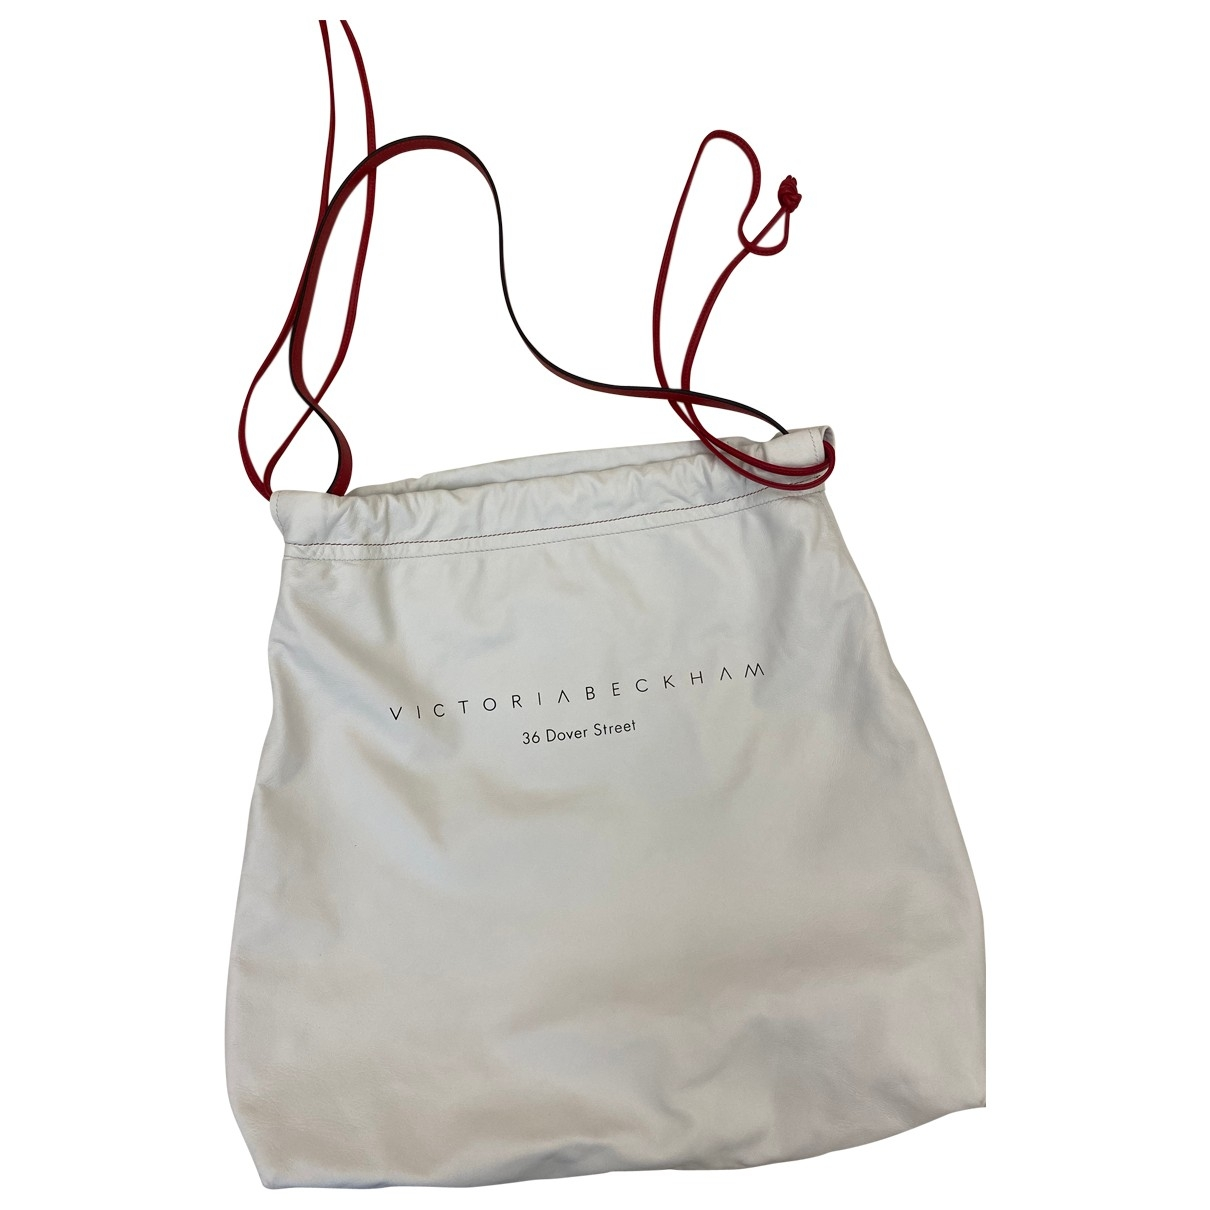 Victoria Beckham \N White Leather handbag for Women \N